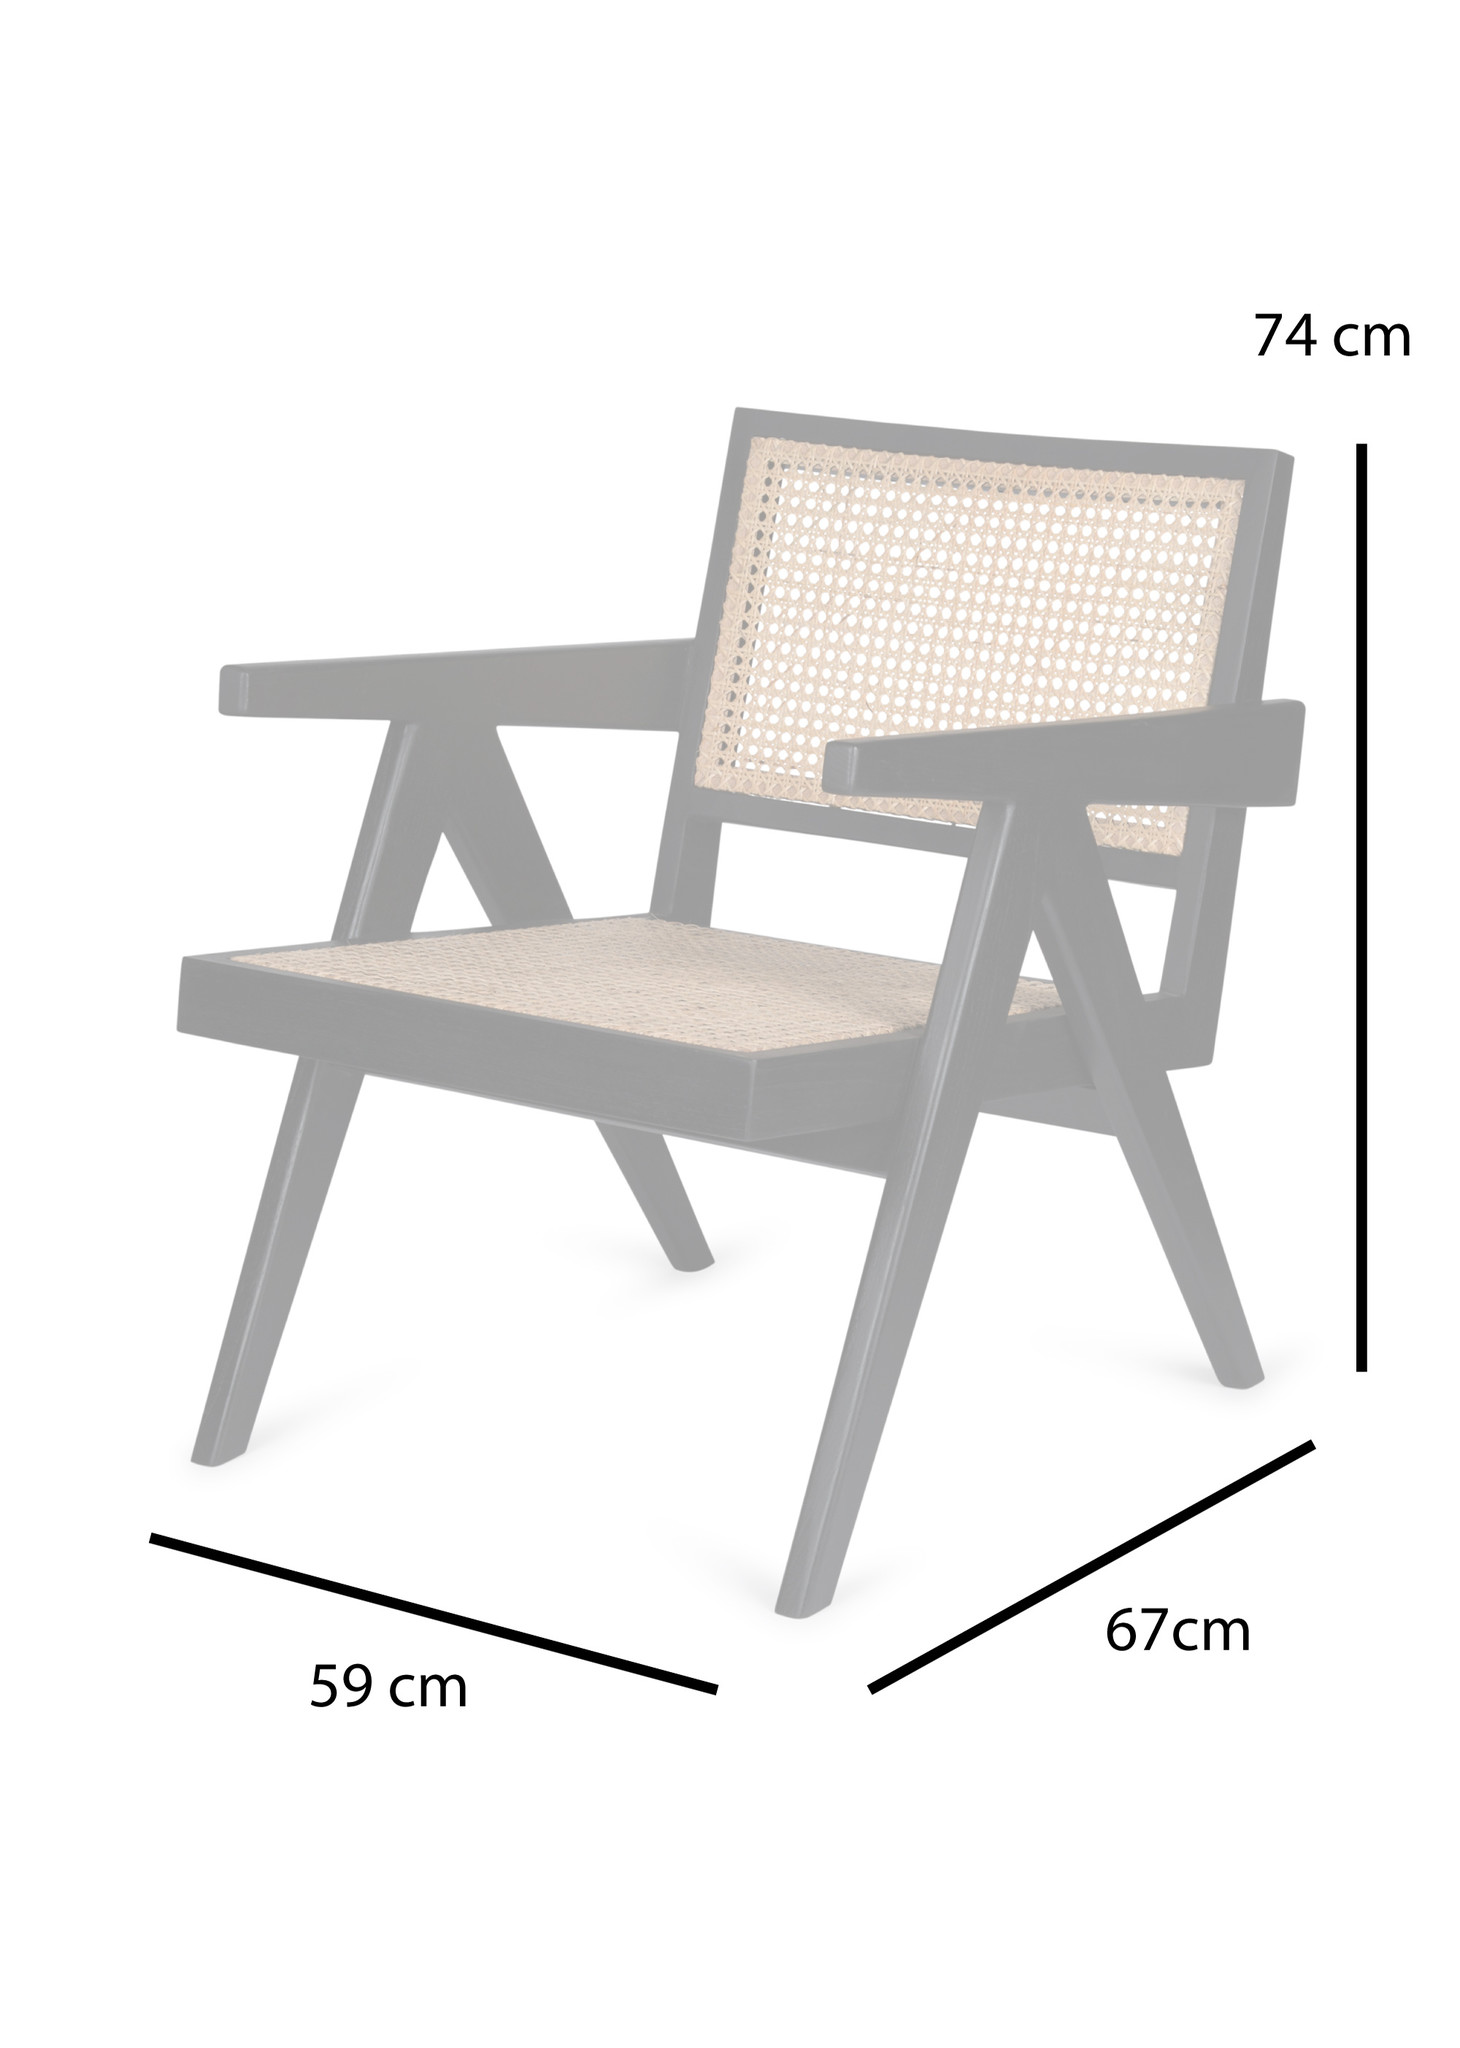 Easy Lounge Chair - Darkened Teak-4